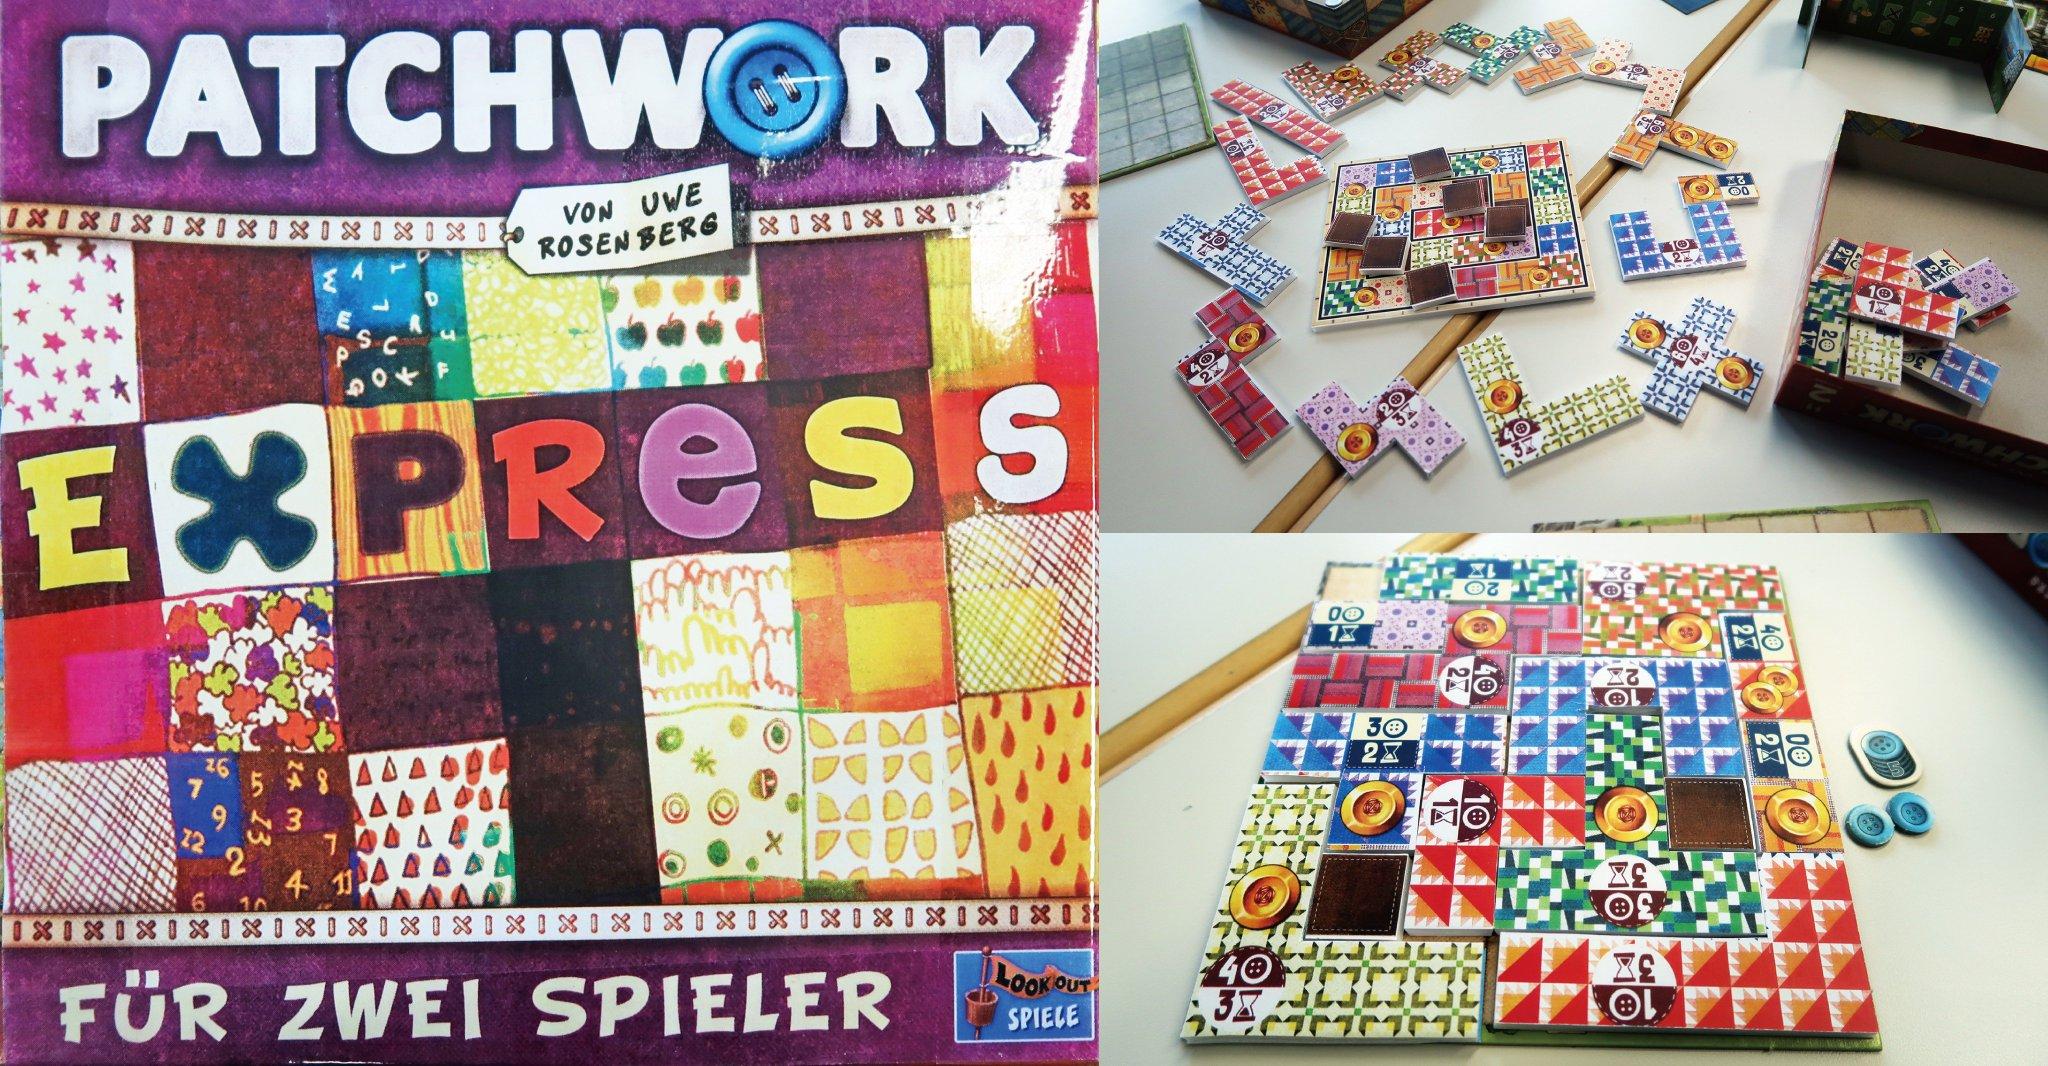 patchwork Expres juego de mesa